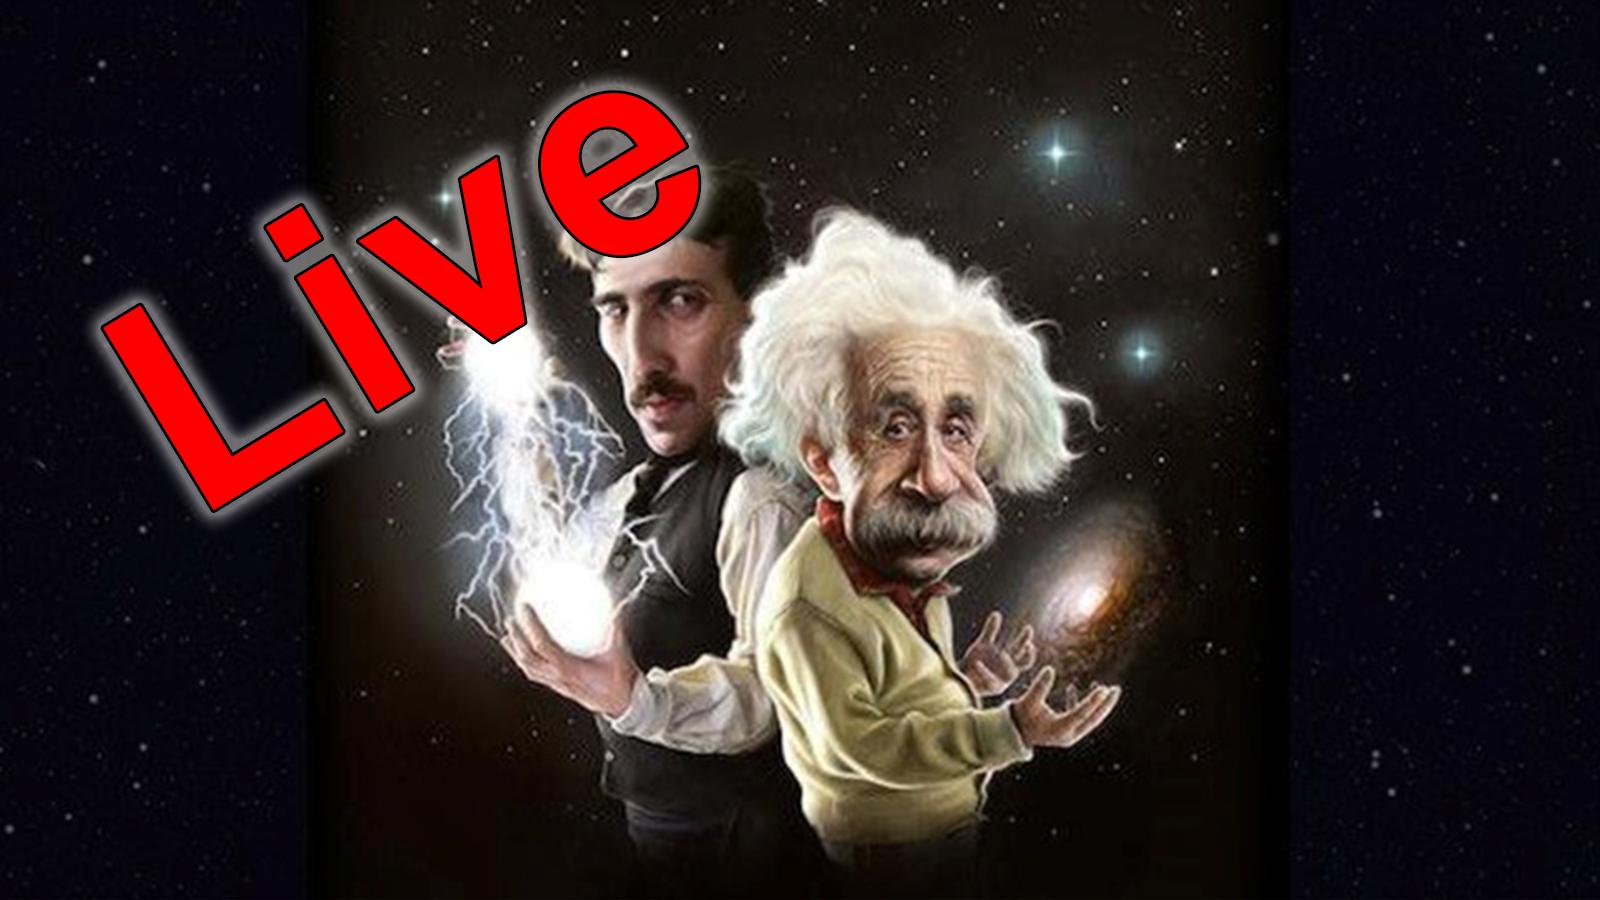 LIVE Η Φυσική Μαγεύει με διαδικτυακές συναντήσεις 23 Ιανουαρίου 2021